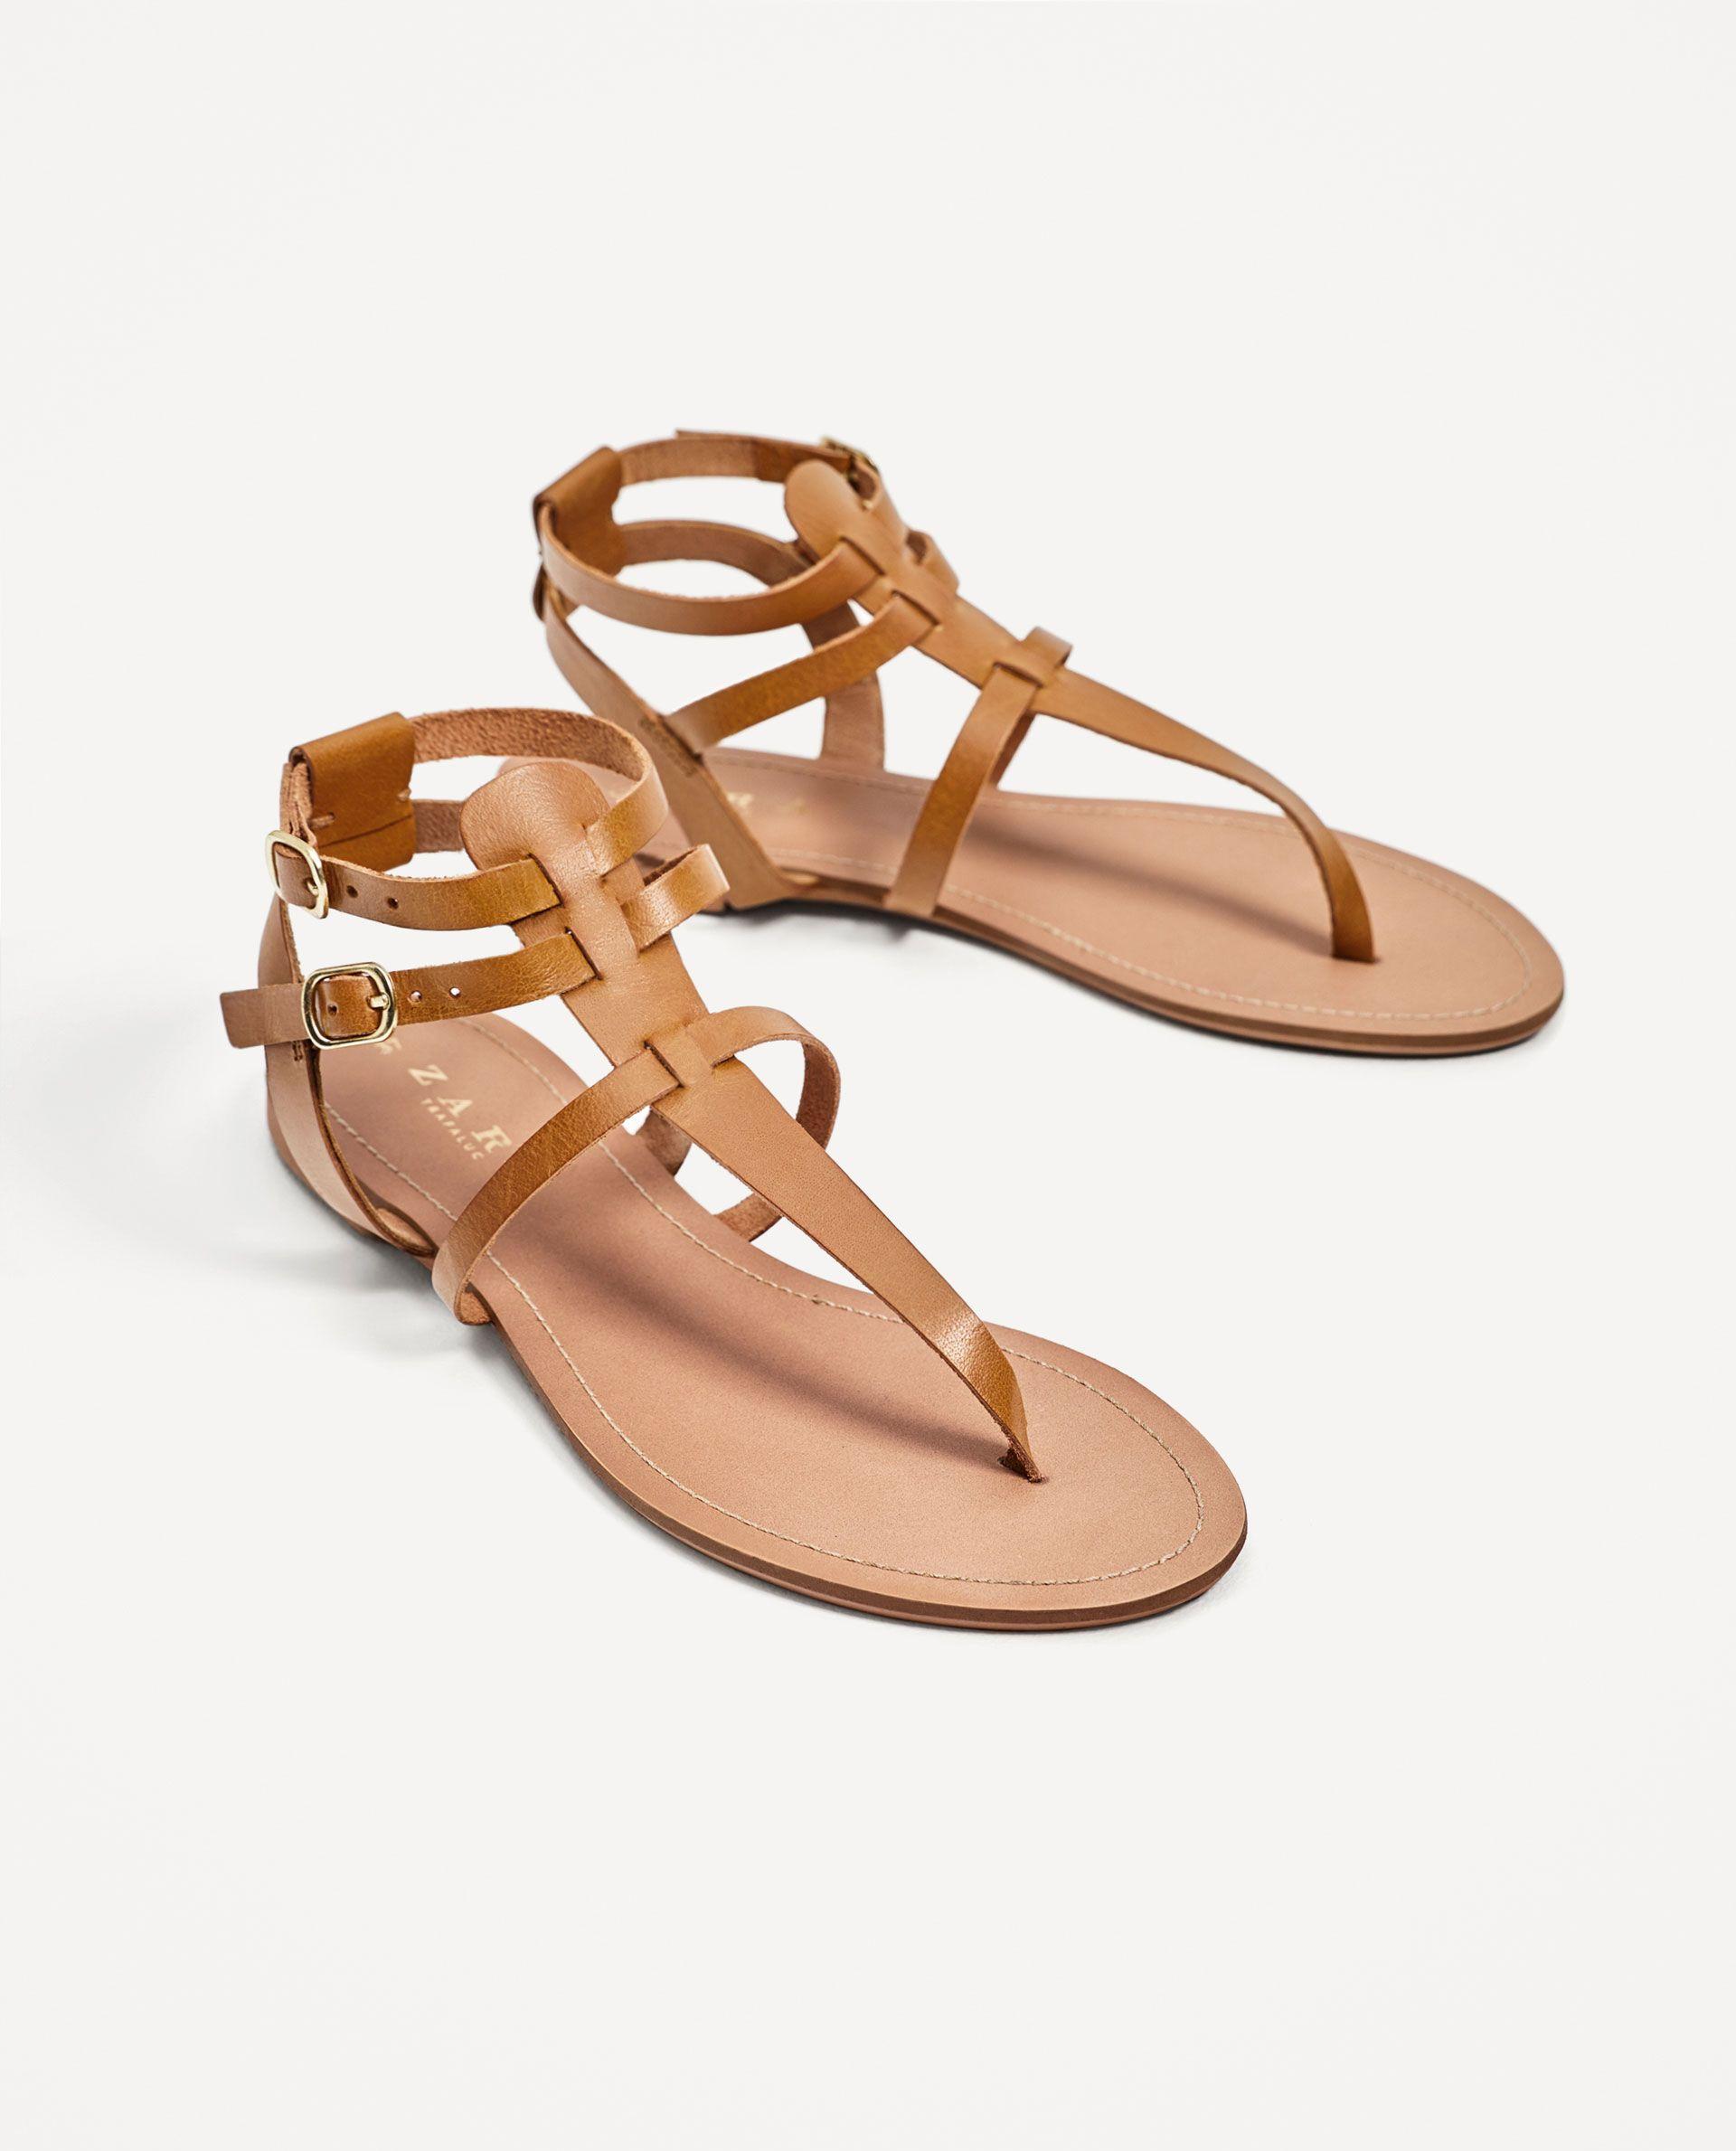 Sandalia Plana Piel Fashion Sandalias Planas Zapatos